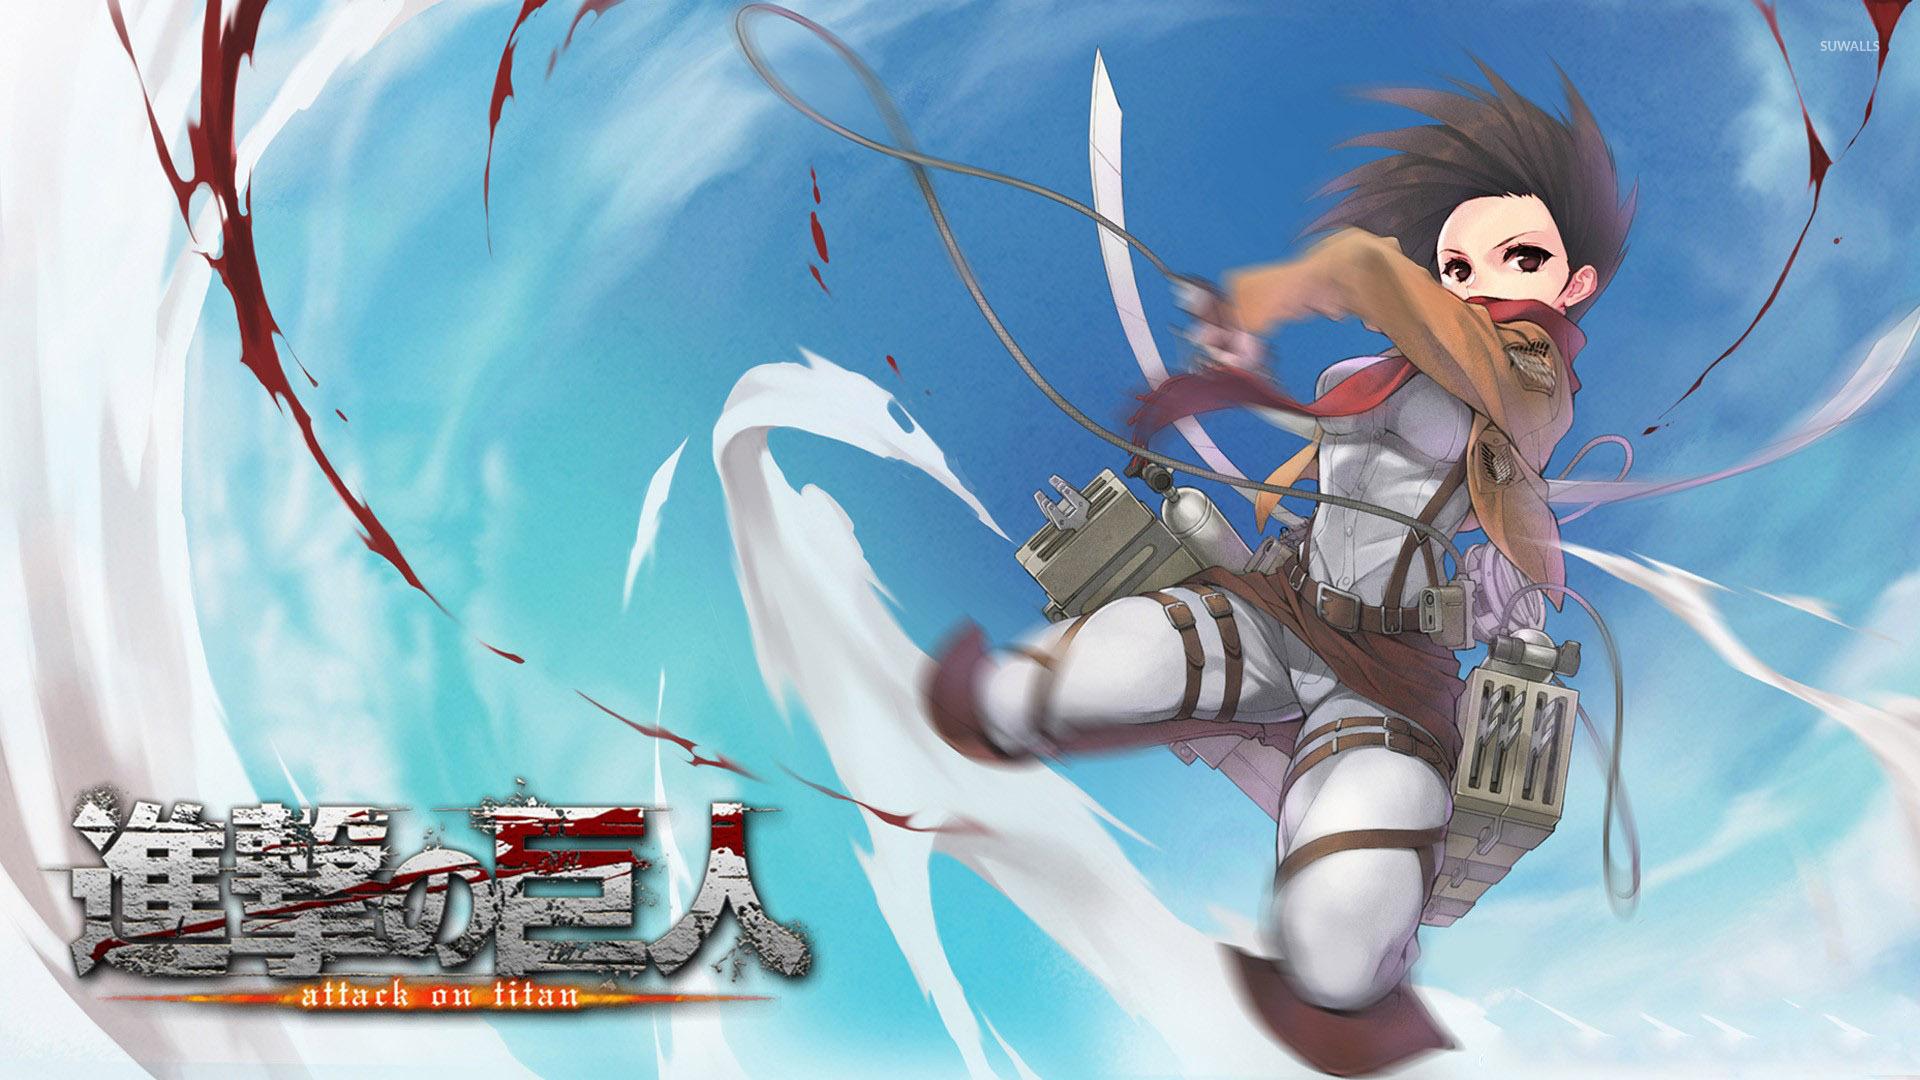 Attack On Titan Mikasa Snk Shingeki No Kyojin 1920x1080 Wallpaper Teahub Io